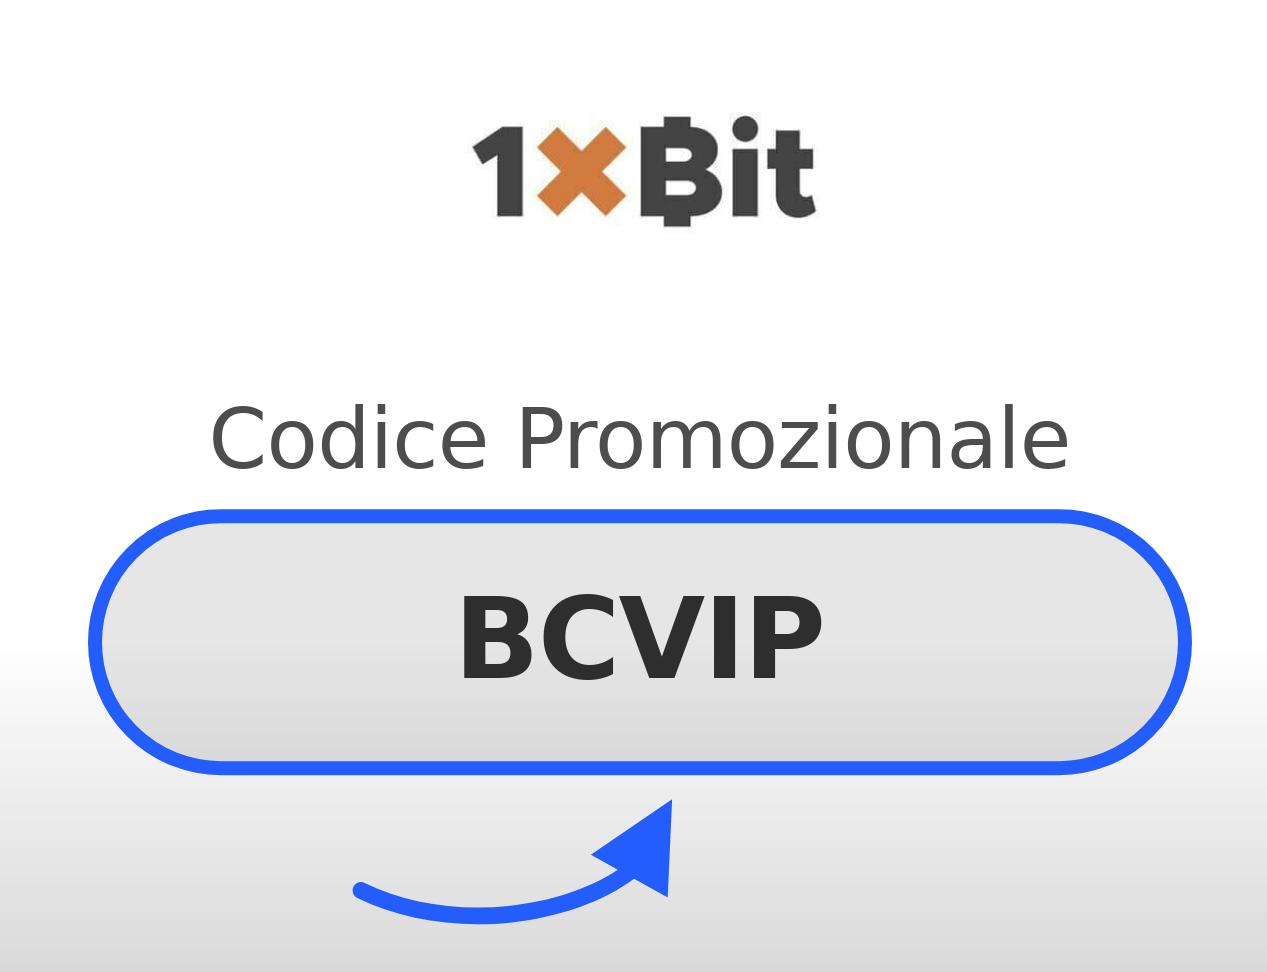 Codice Promozionale 1xBIT